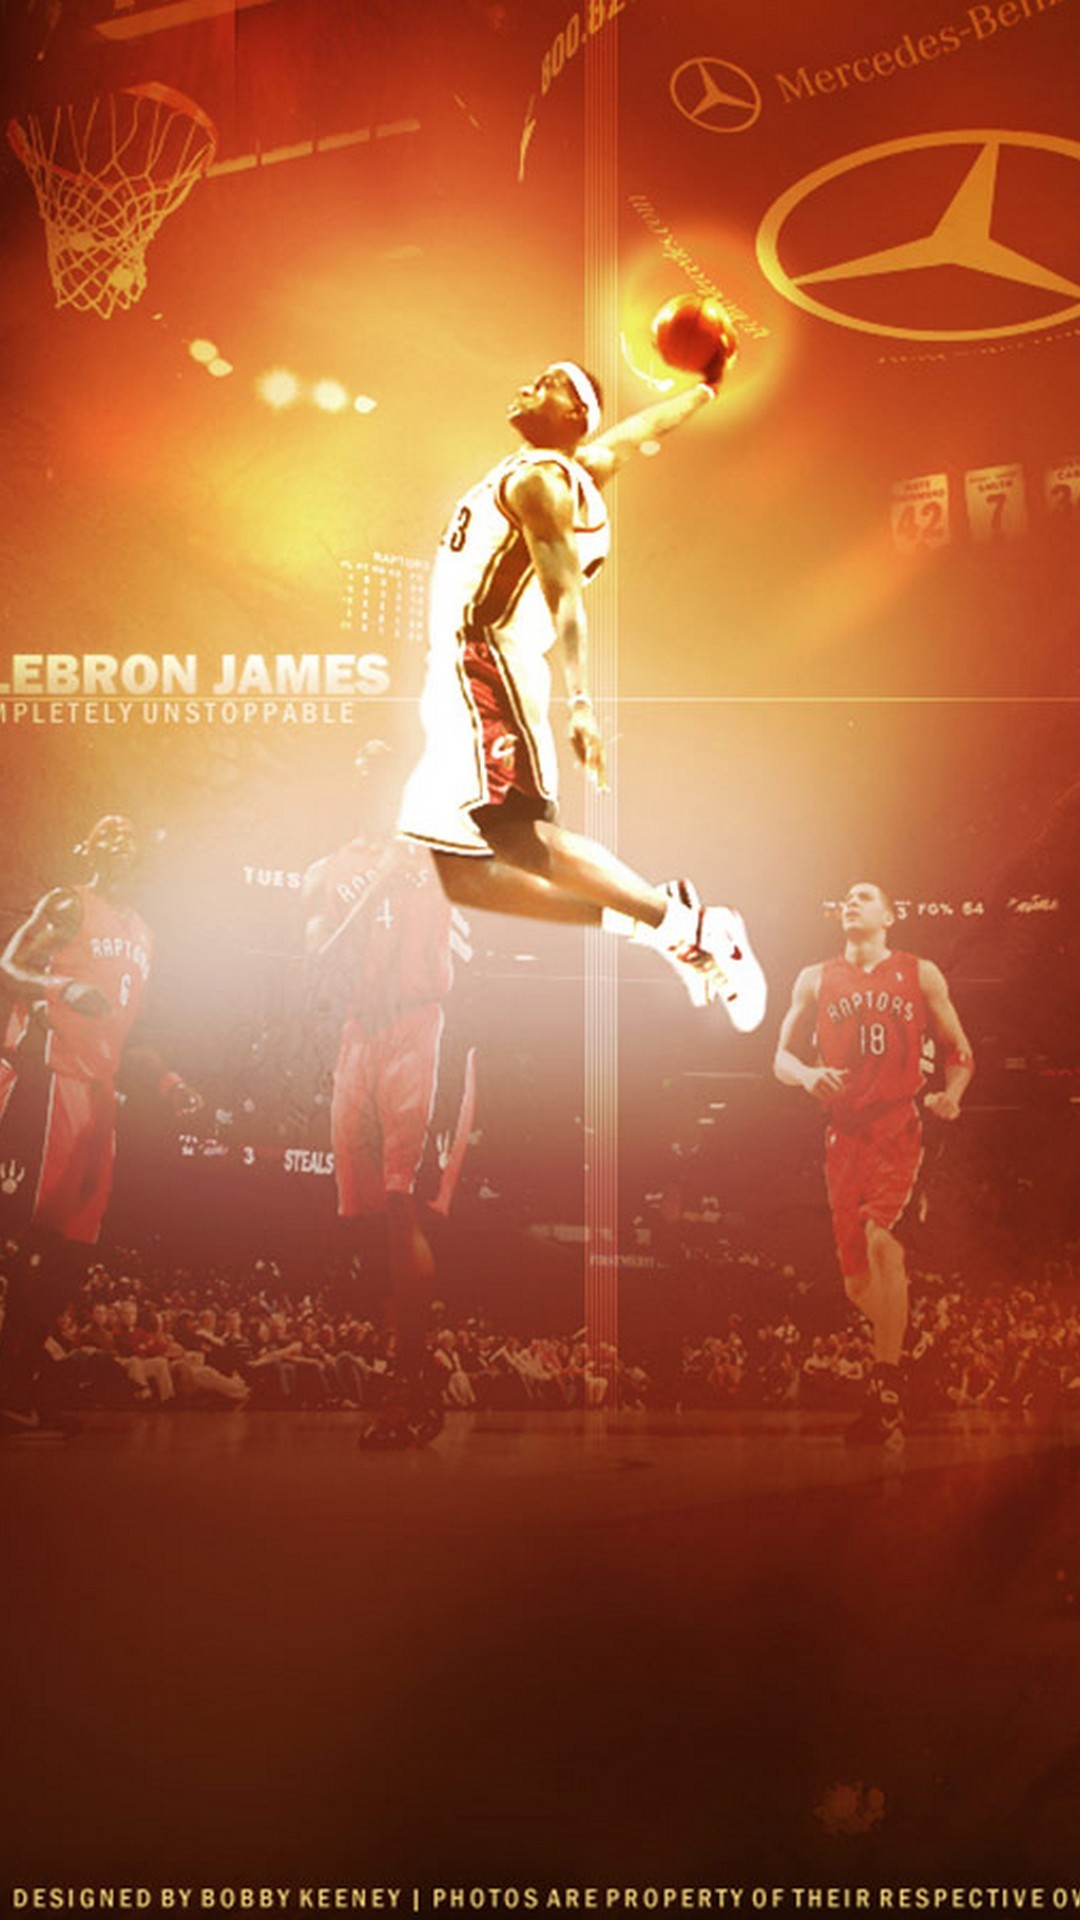 Wallpaper Mobile NBA 2020 Basketball Wallpaper 1080x1920